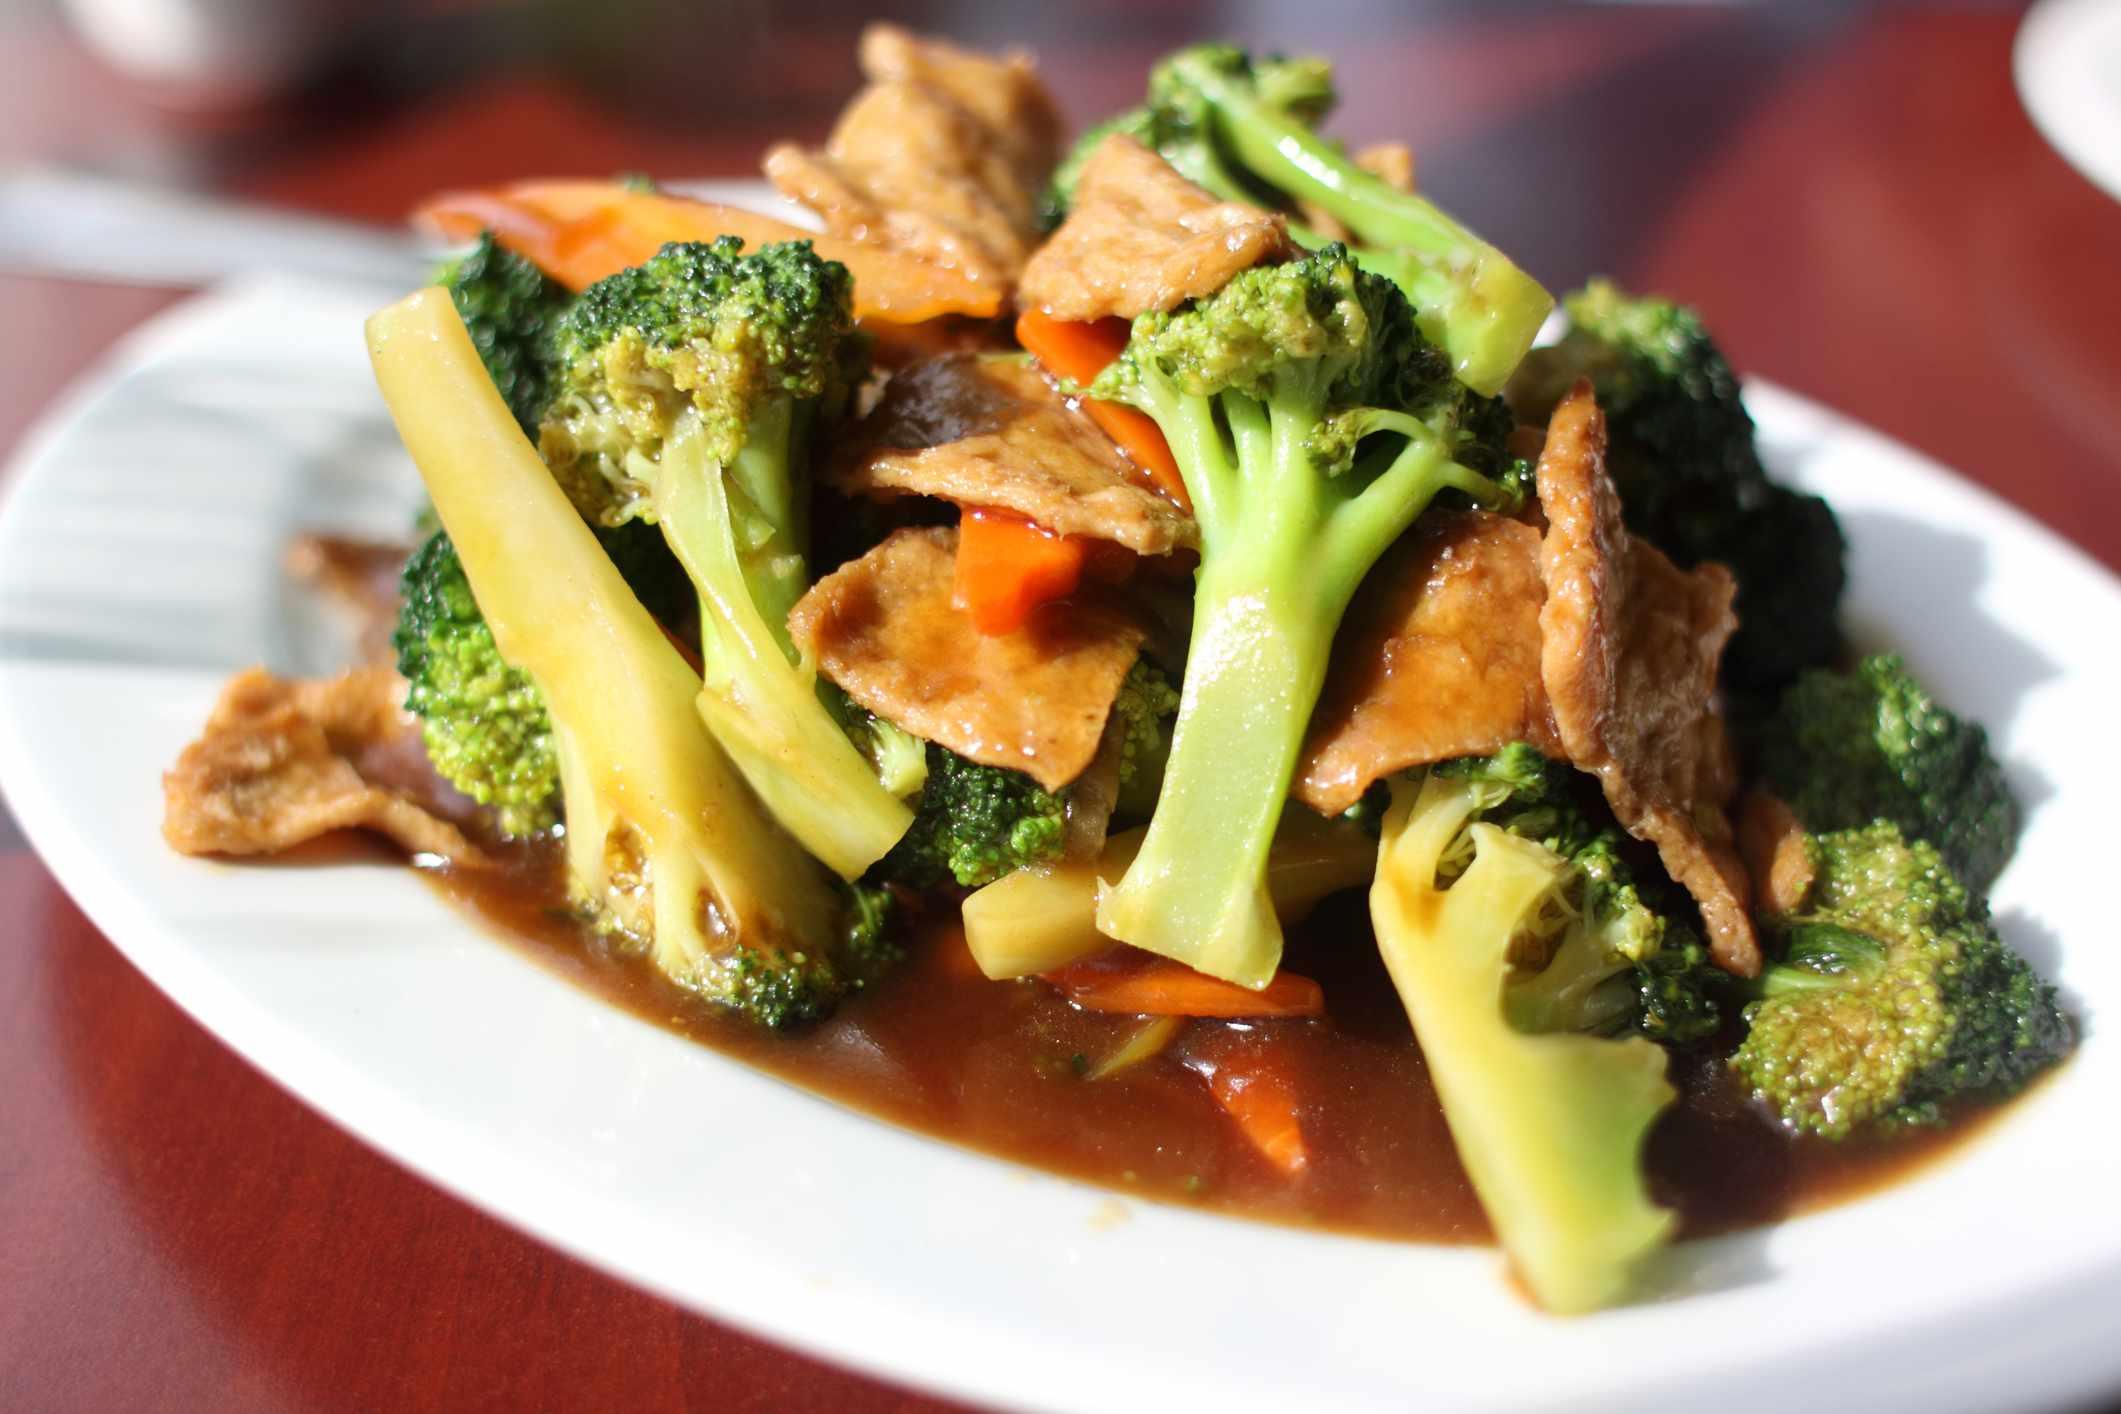 Vegan Chinese Vegetable and Seitan Stir-Fry Recipe